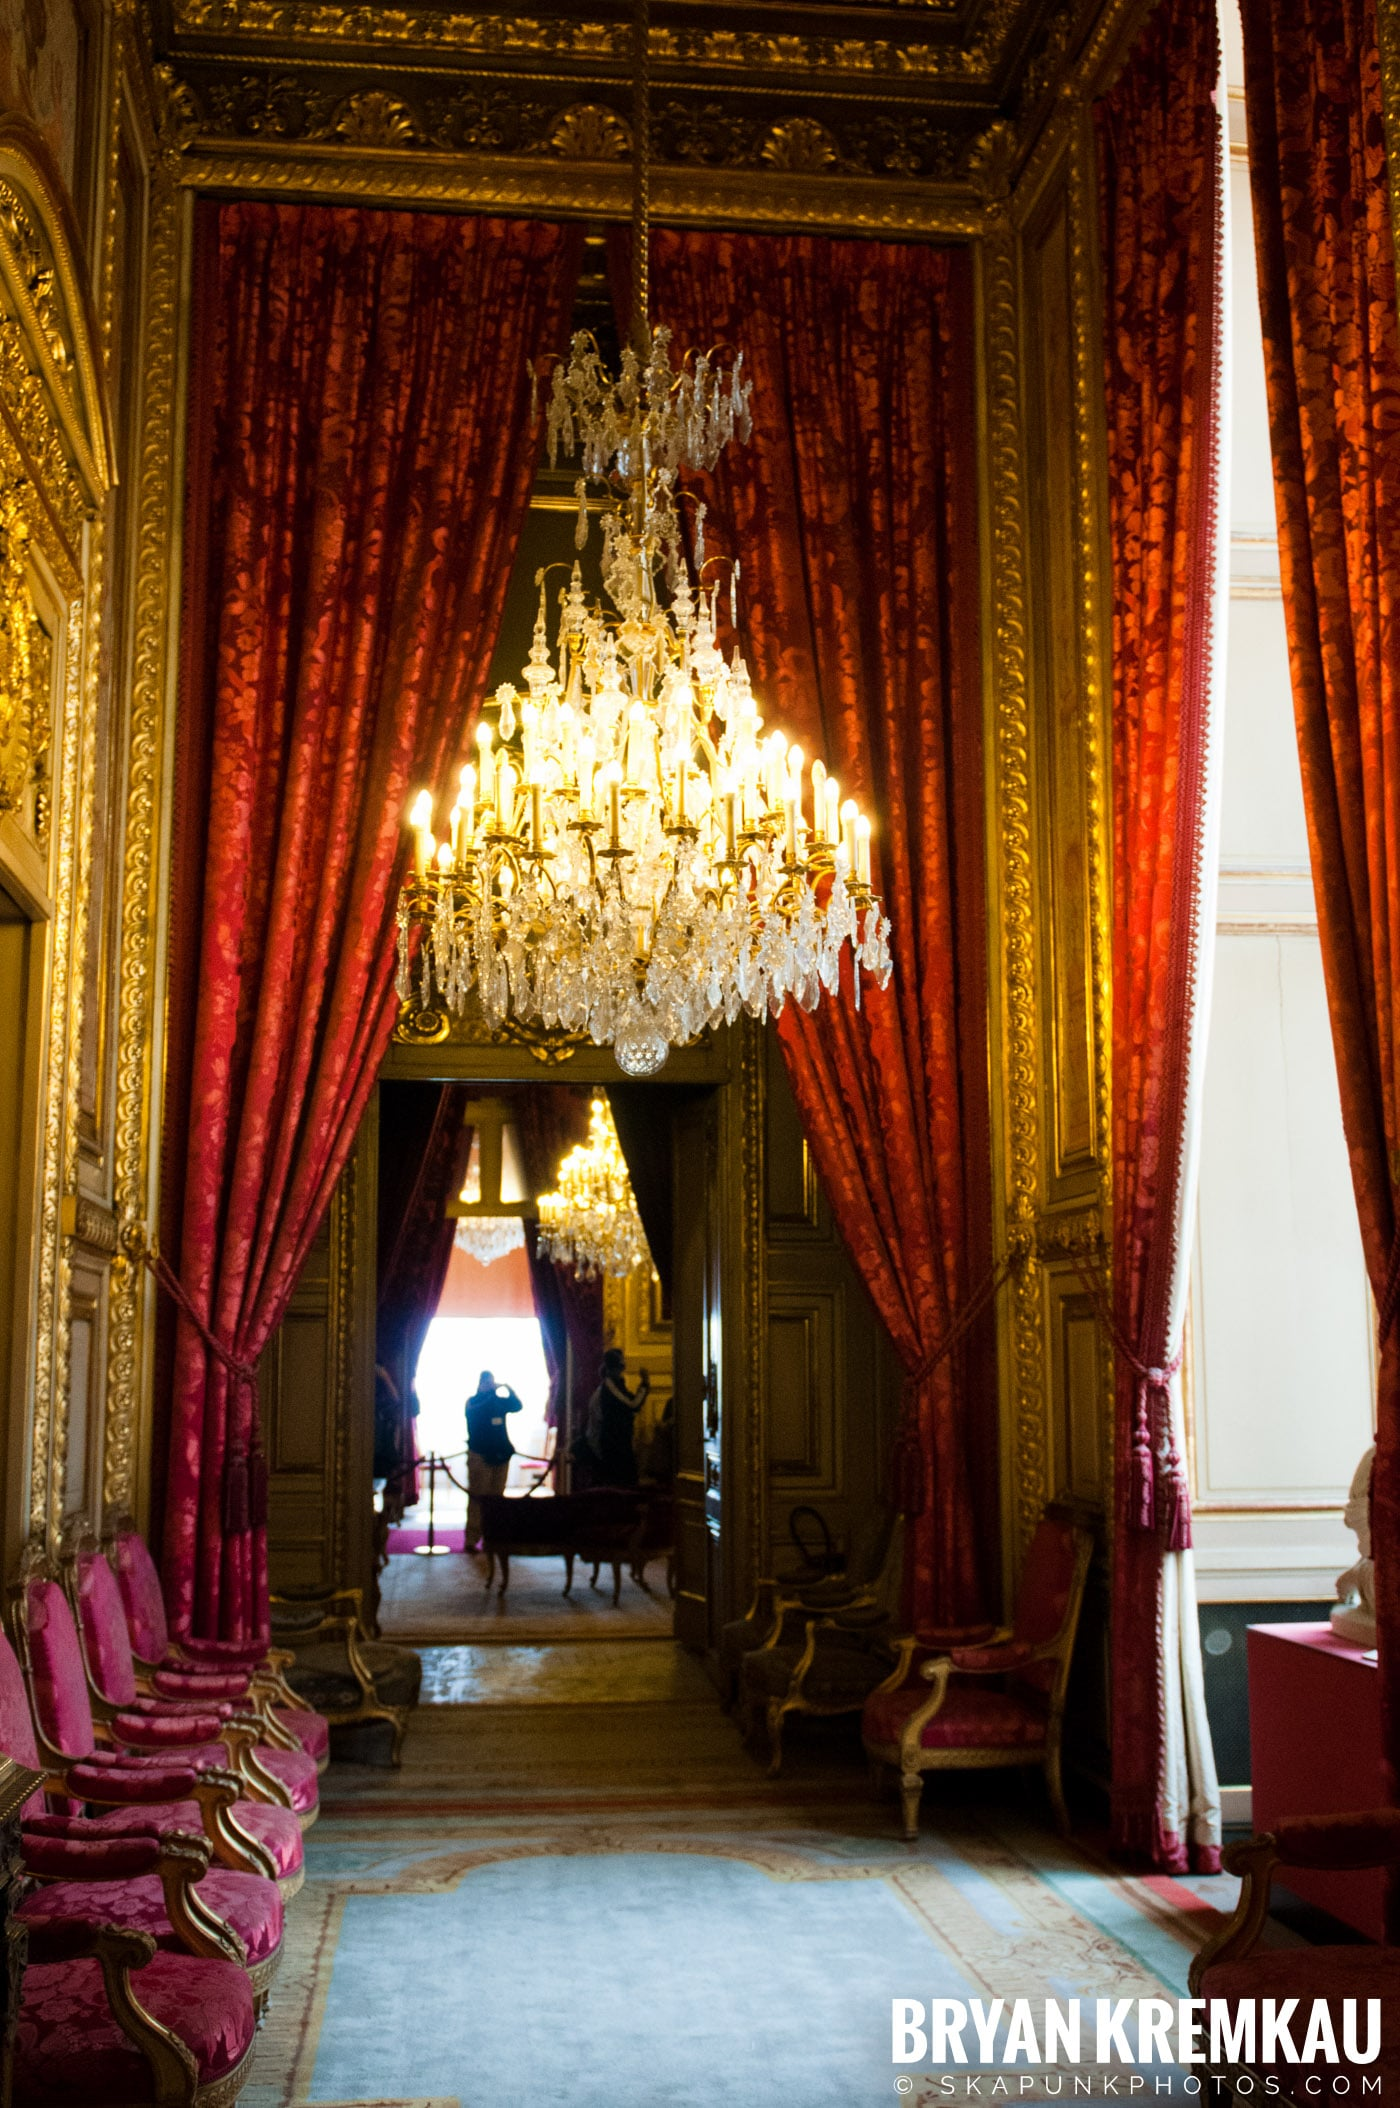 Paris, France Honeymoon - Day 3 - 7.20.11 (67)